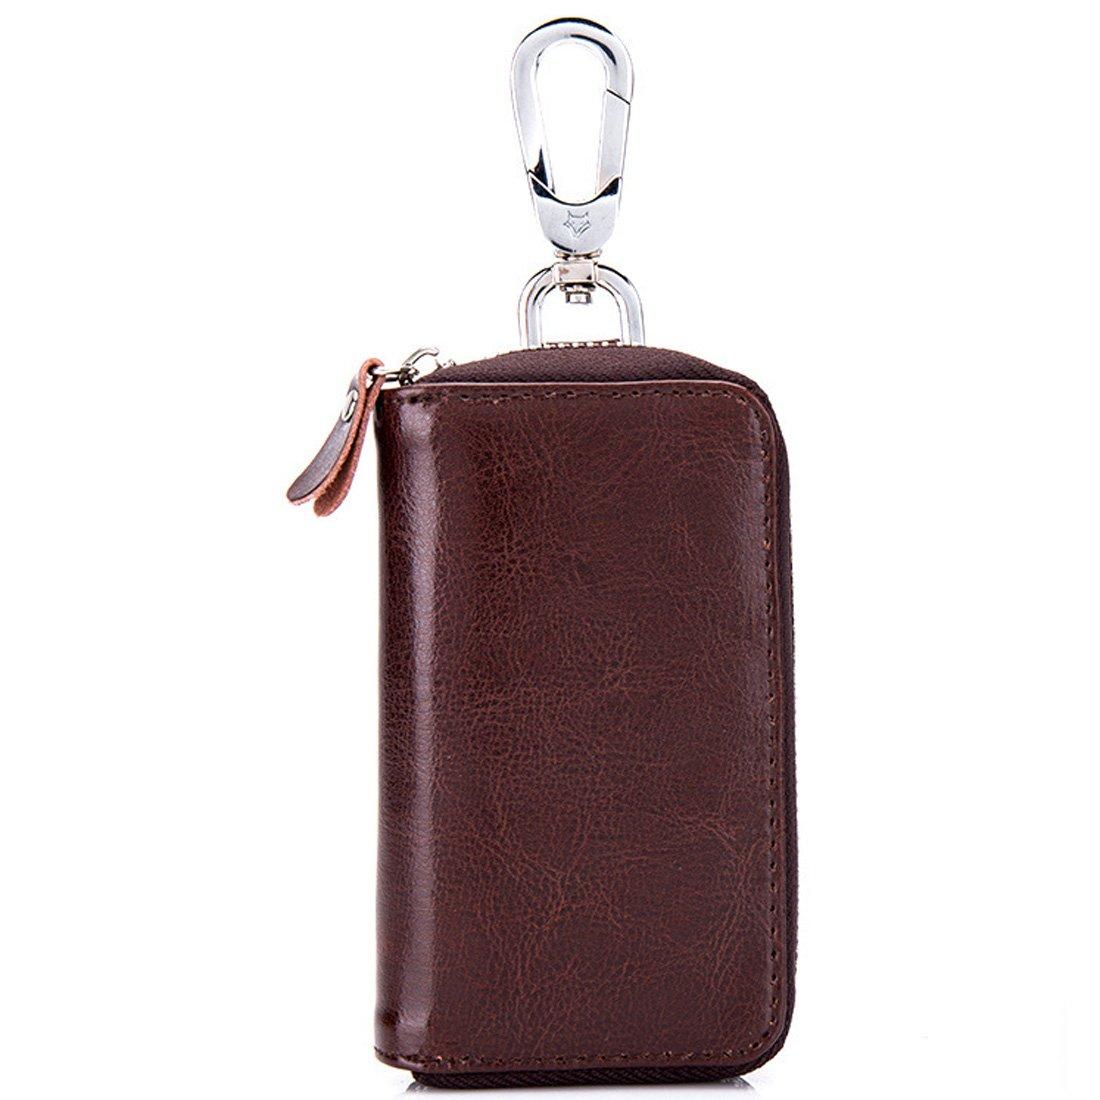 Esdrem Unisex Car Key Case Holder with 8 Key Hooks Genuine Leather Zippered Car Keychain Wallet Burgundy